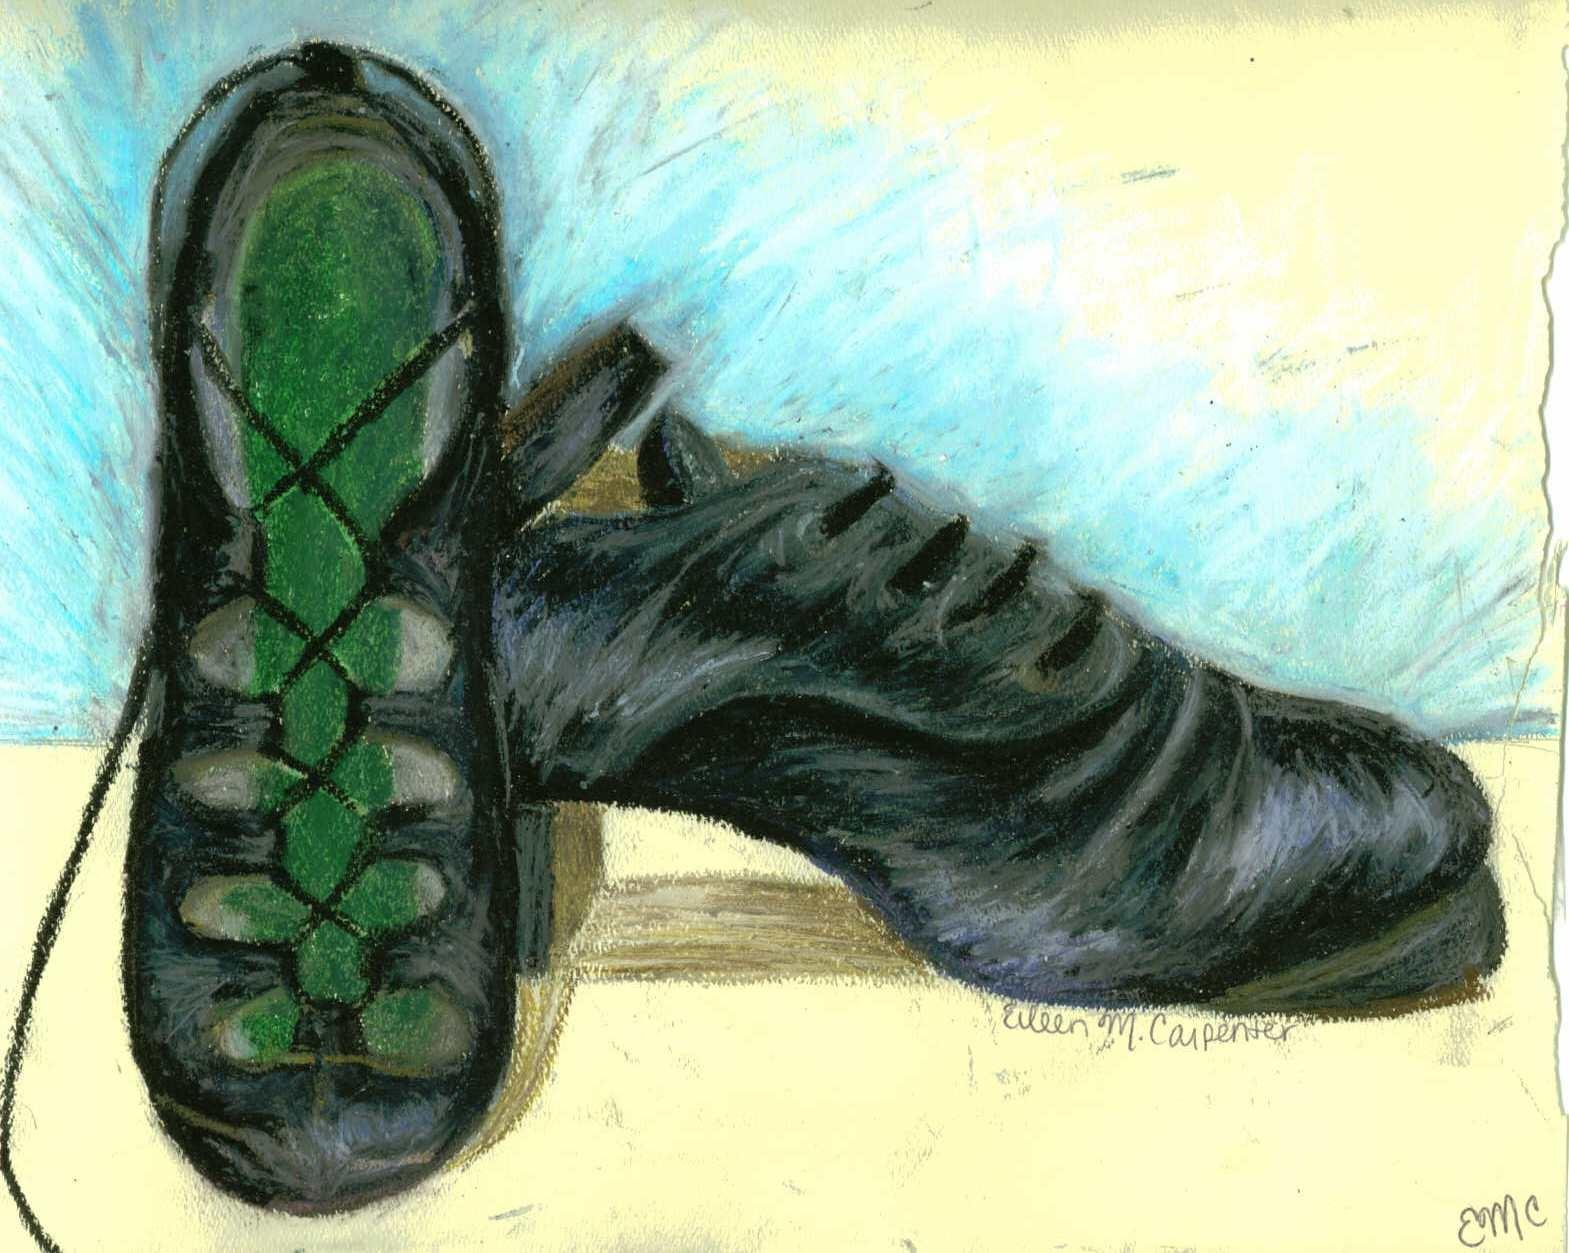 Drawn shoe dance shoe Irish livelovedraw by livelovedraw irish